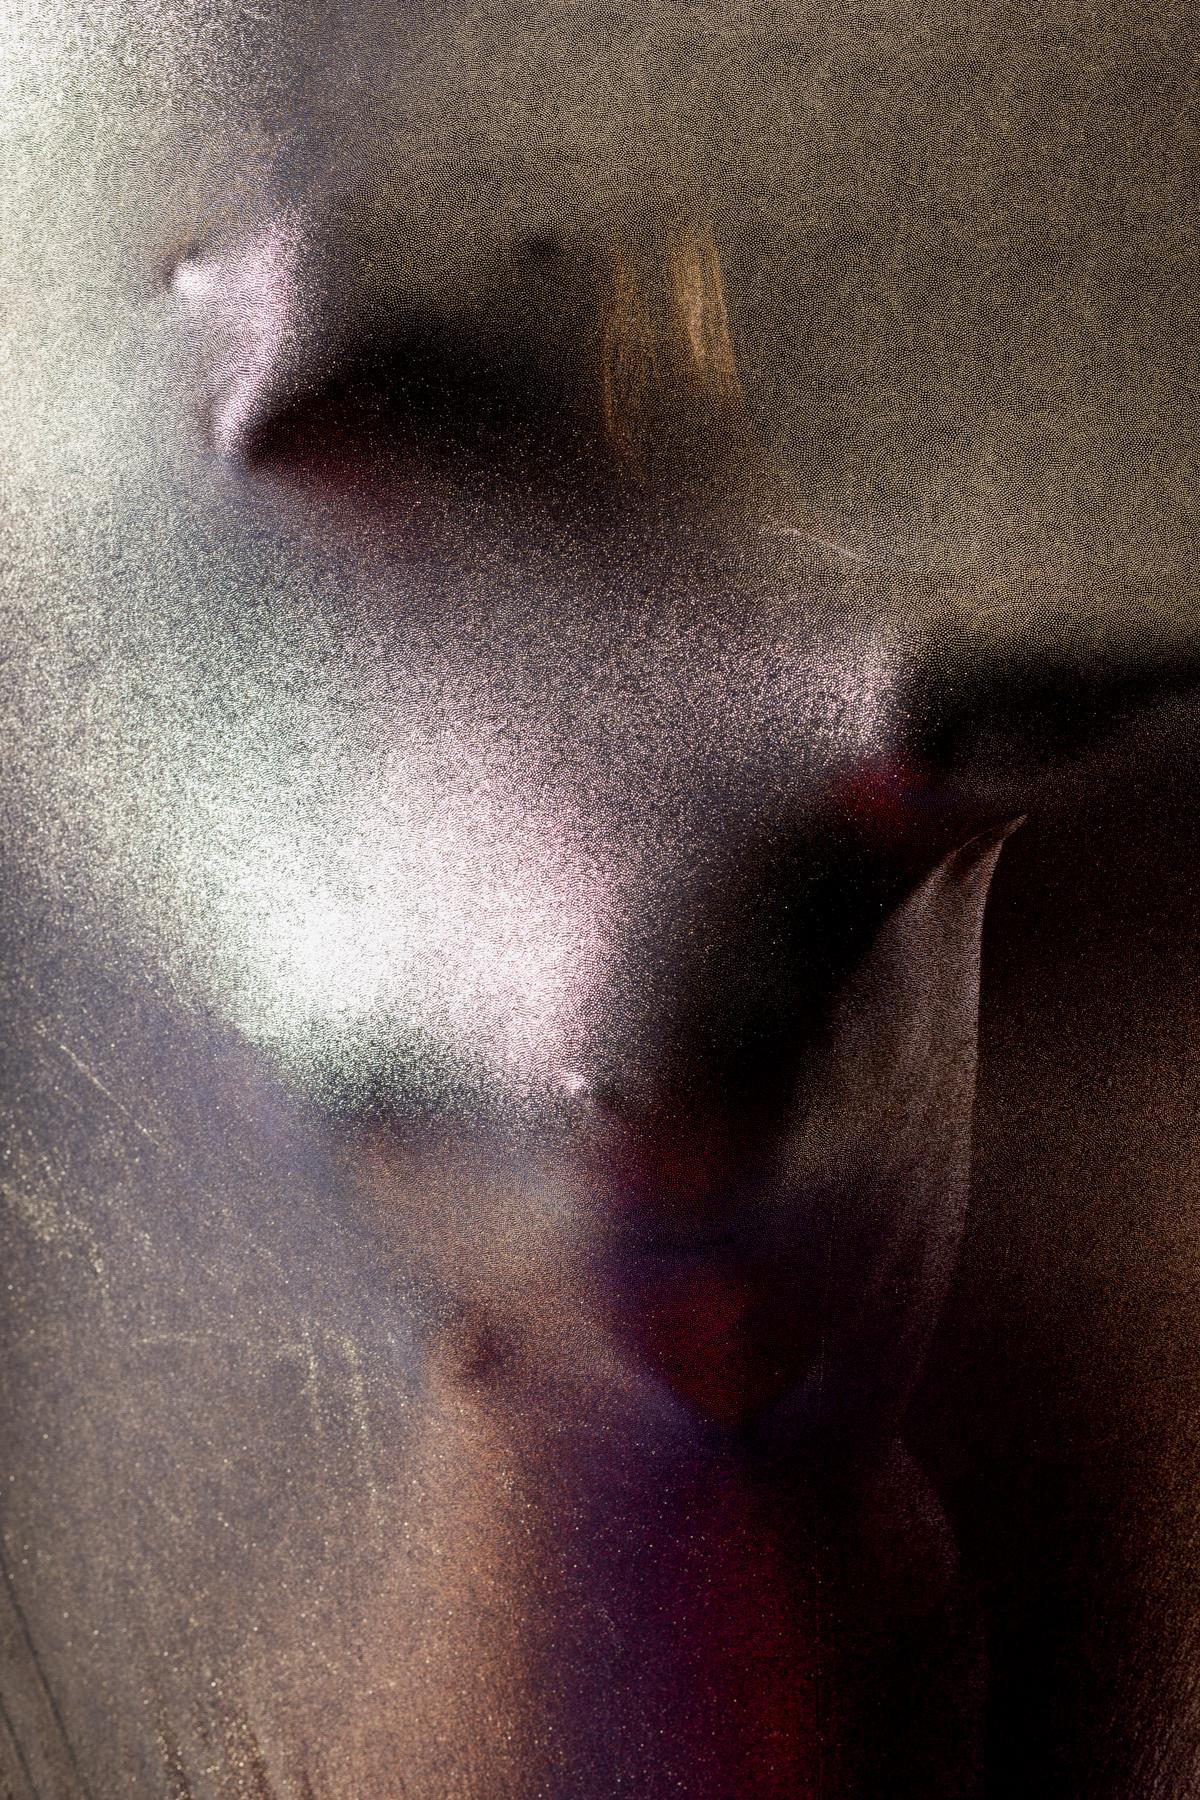 Ursula_Lelen_Beyond Limits_Emergence_5.jpg